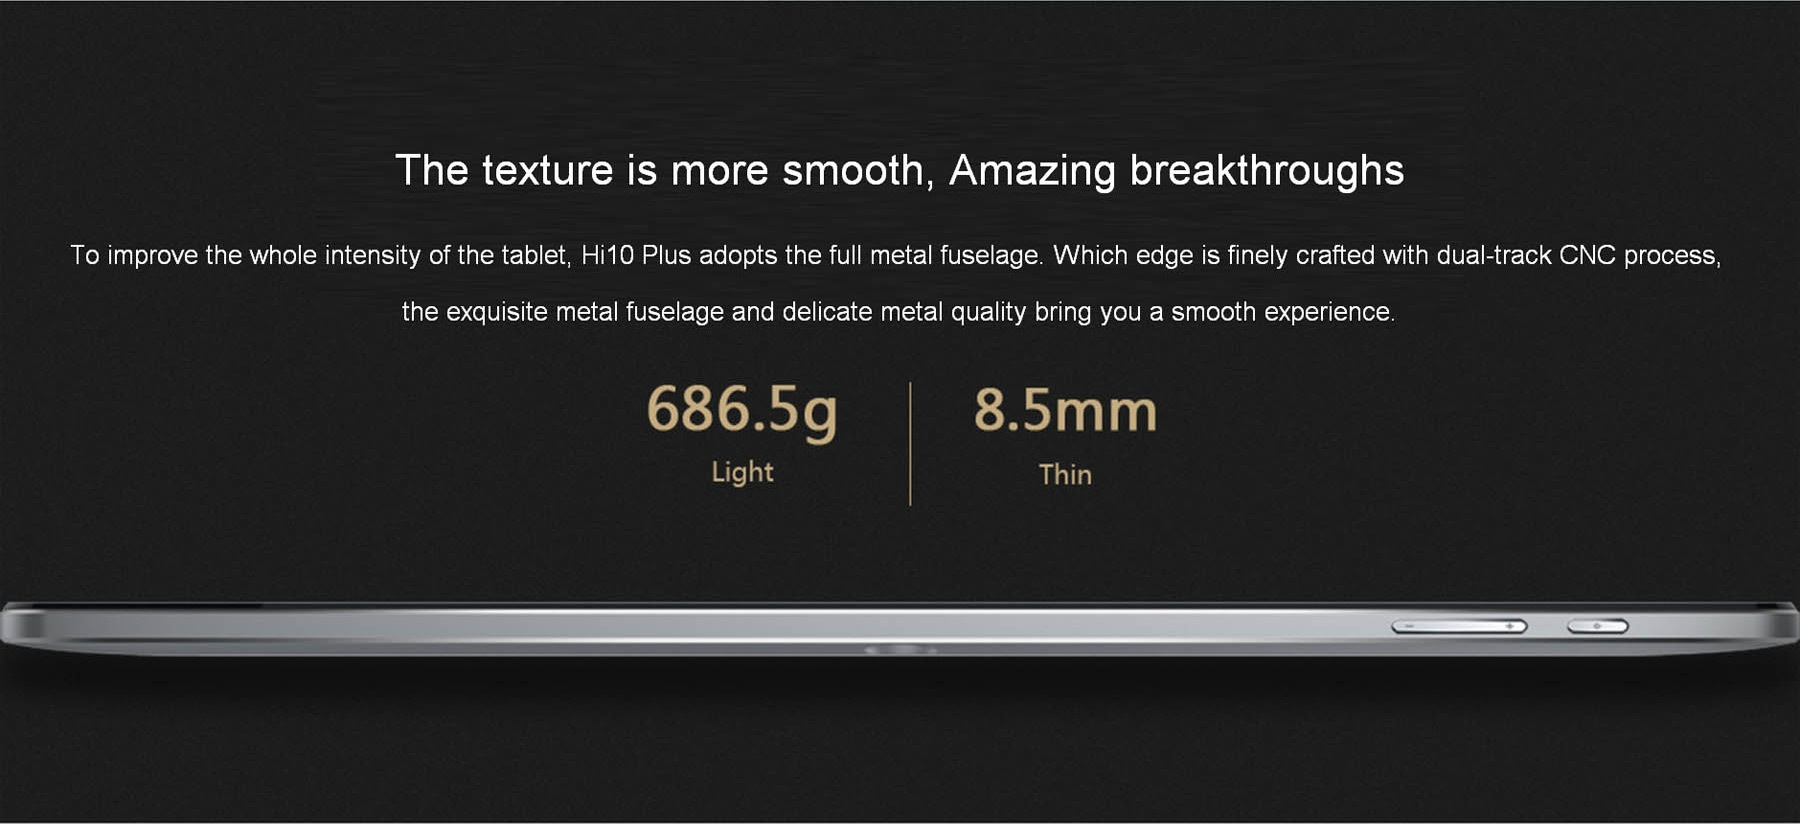 CHUWI HI10 PLUS 10.8 inch Windows 10 + Android 5.1 Tablet PC Intel Cherry Trail X5 Z8350 Quad Core 1.44GHz 4GB RAM 64GB ROM Type-C HDMI